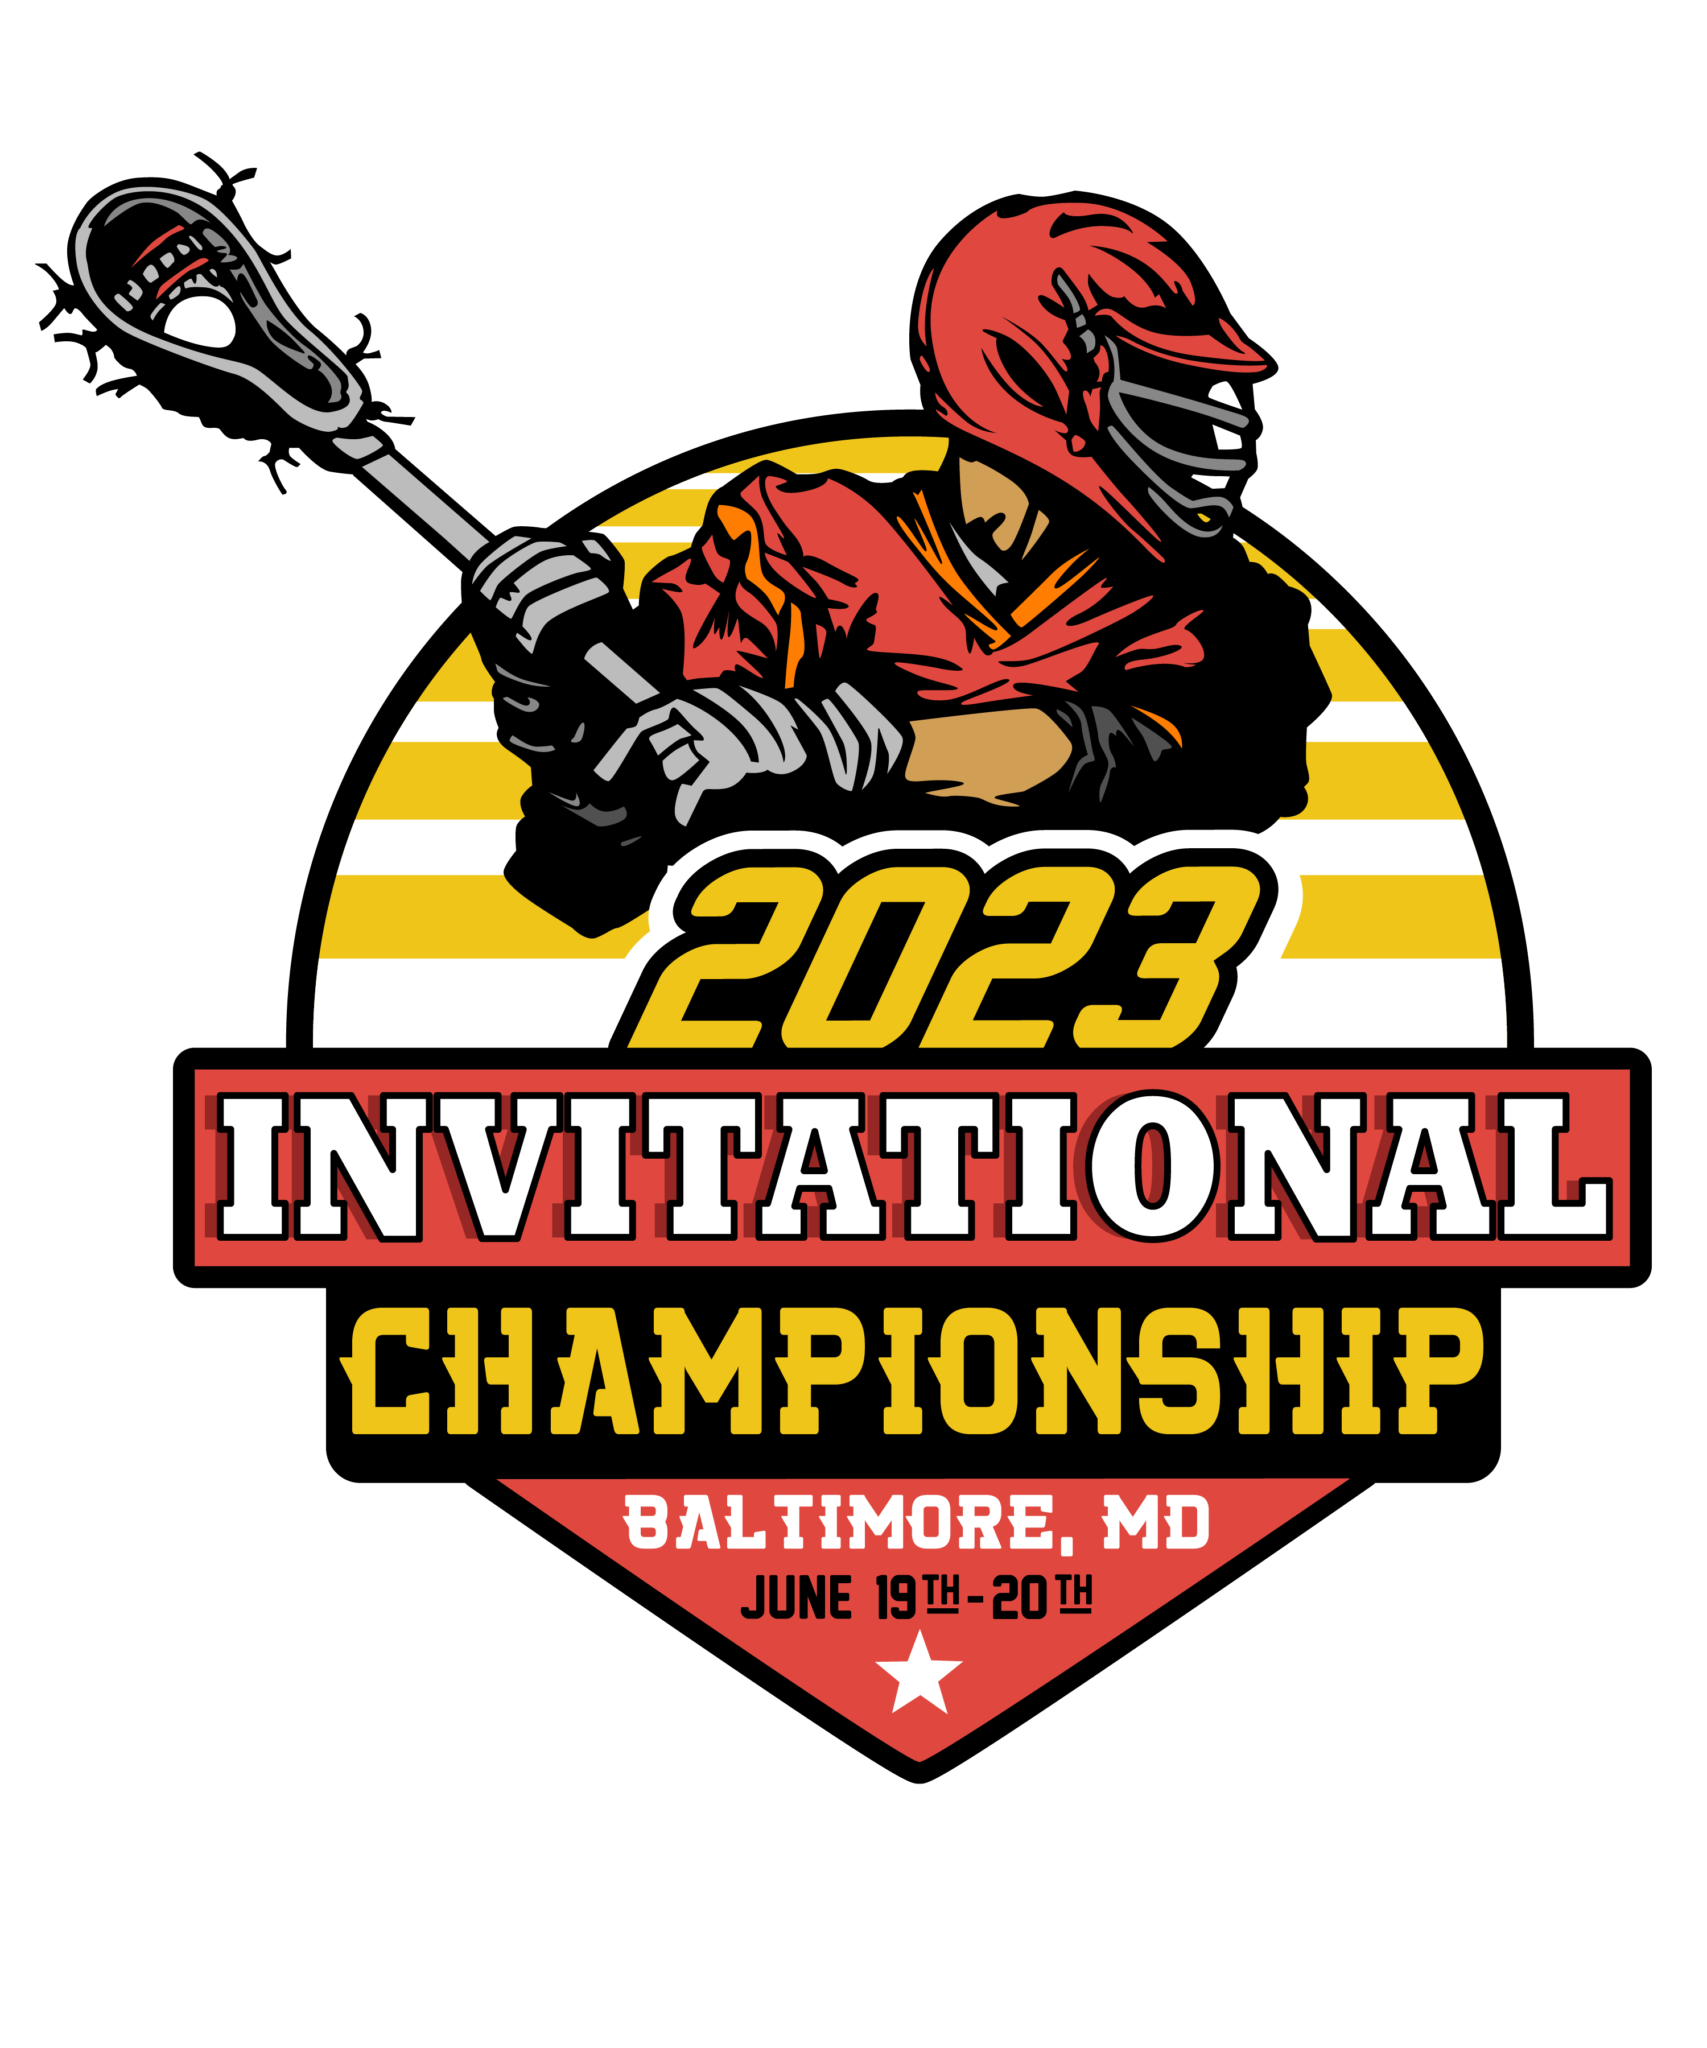 2023 Invitational Championship